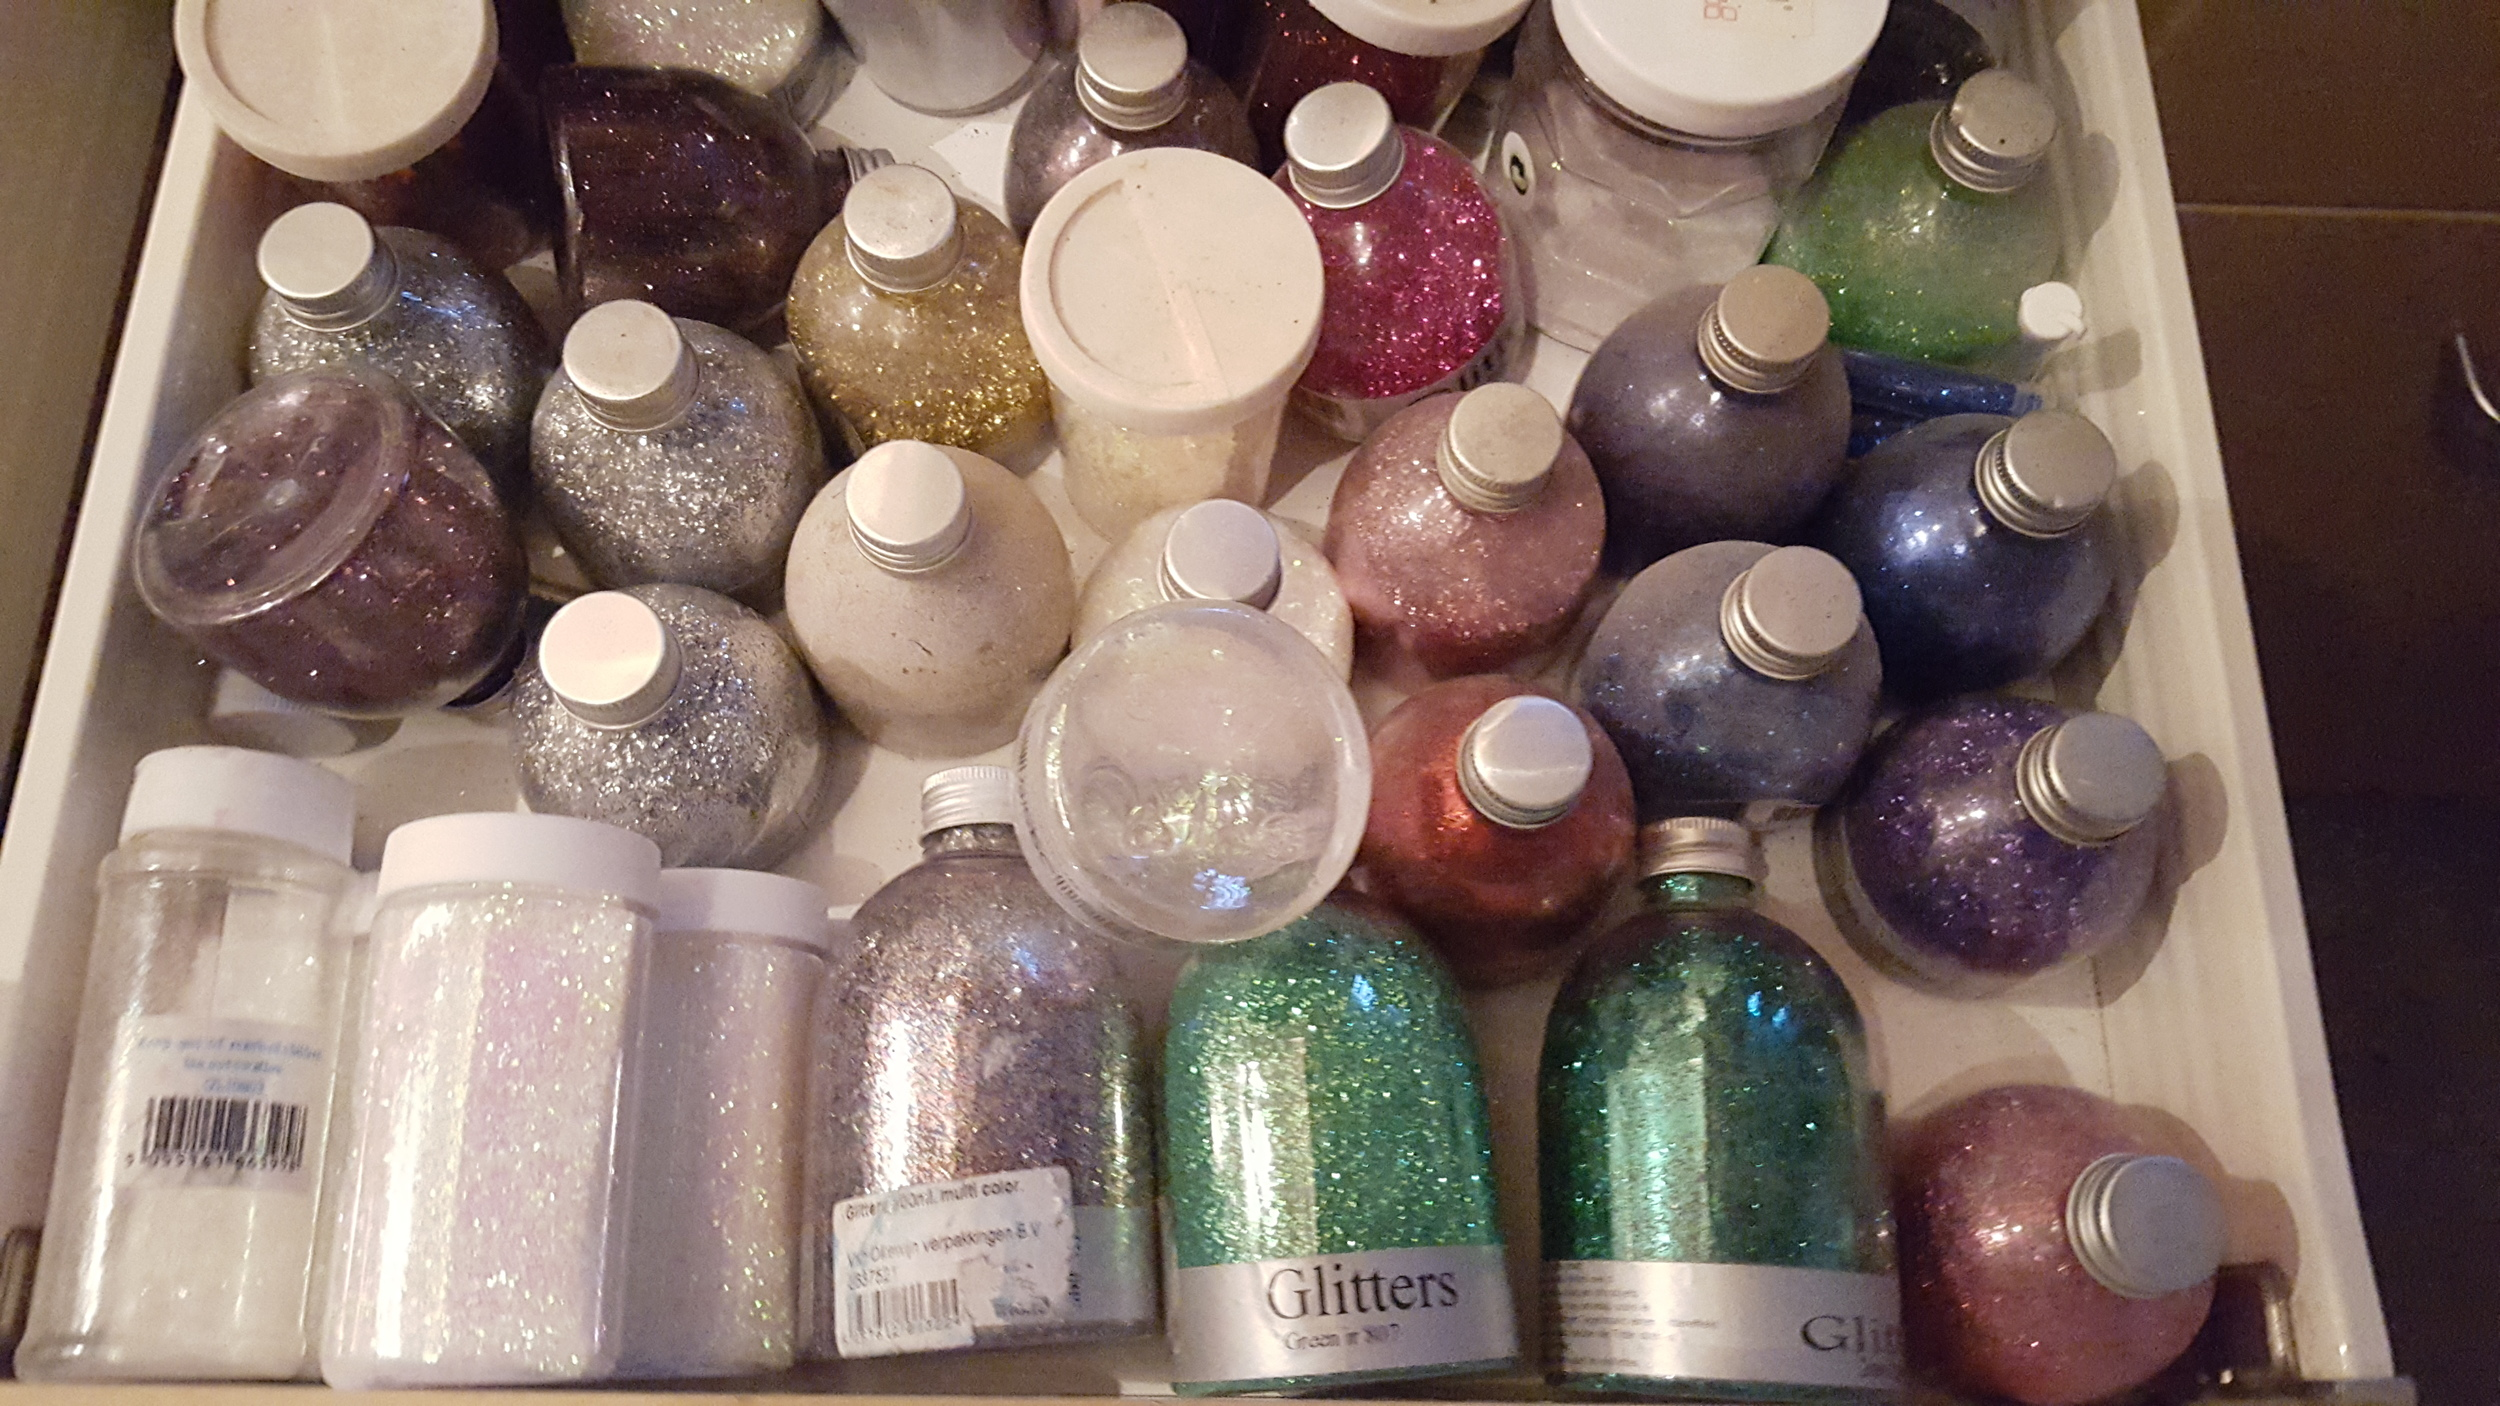 Glitter Drawer. All in One Season workshops